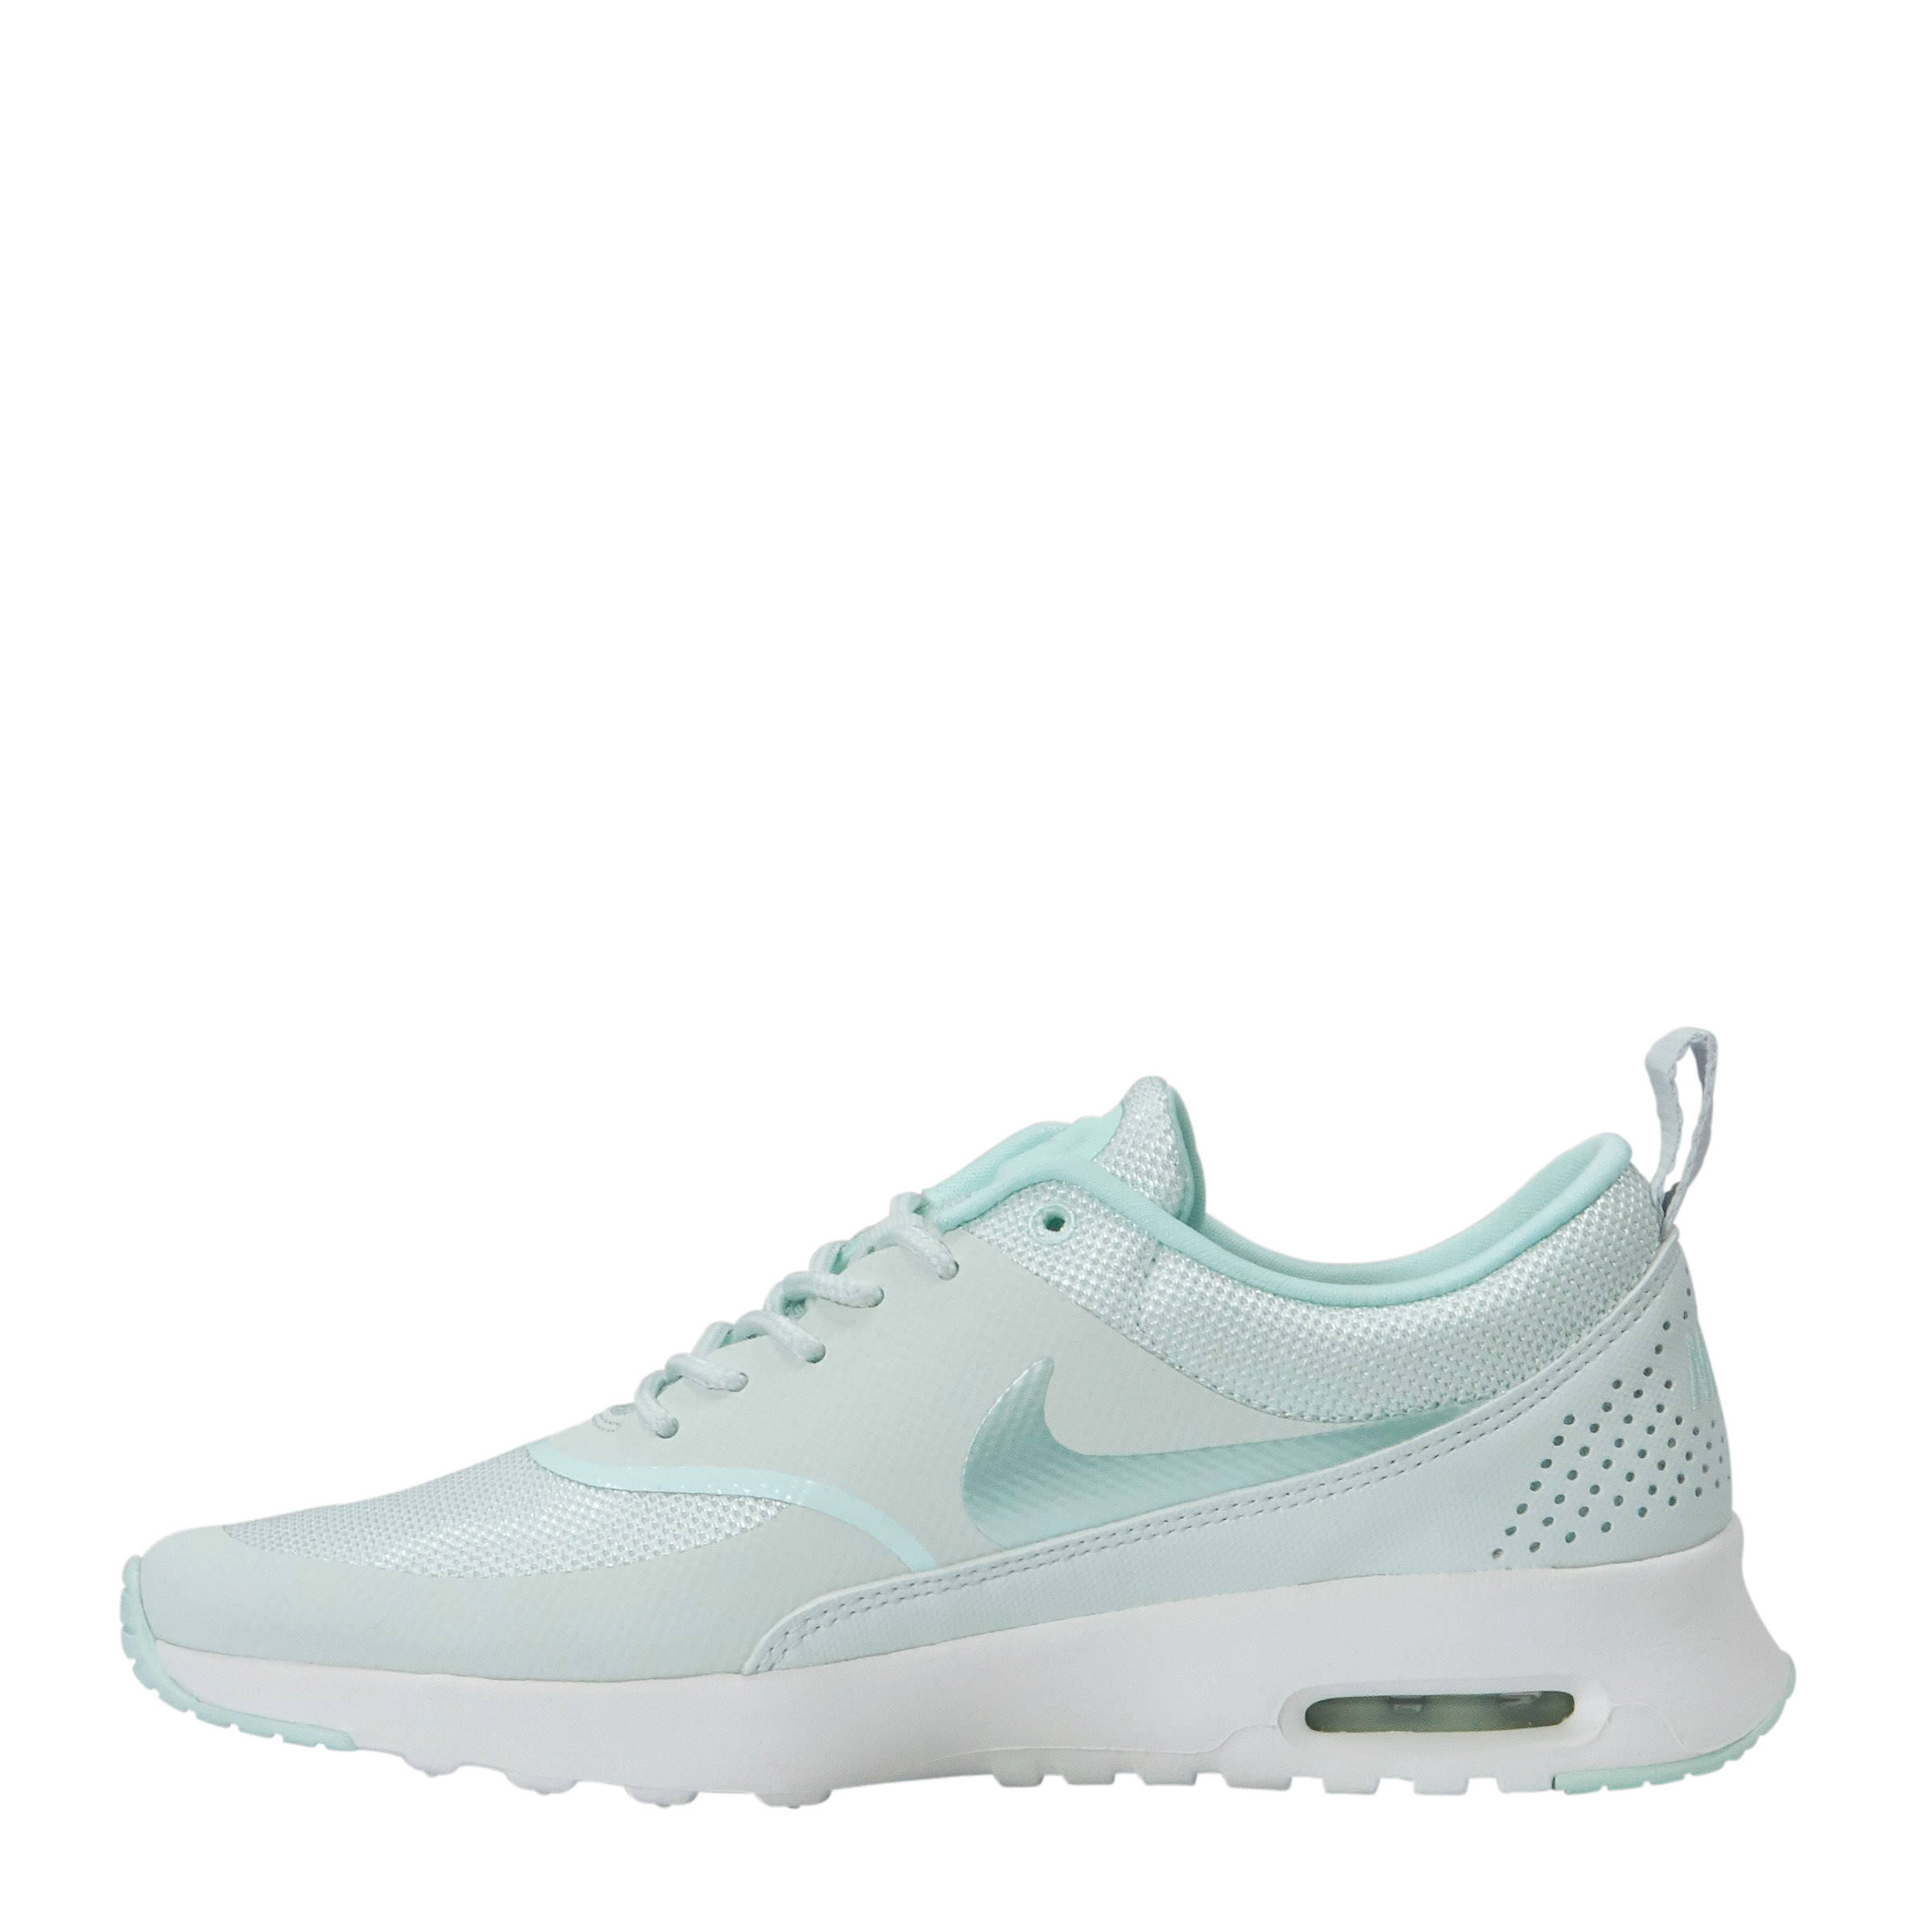 417e6050a90 Nike Air Max Thea sneakers mintgroen | wehkamp